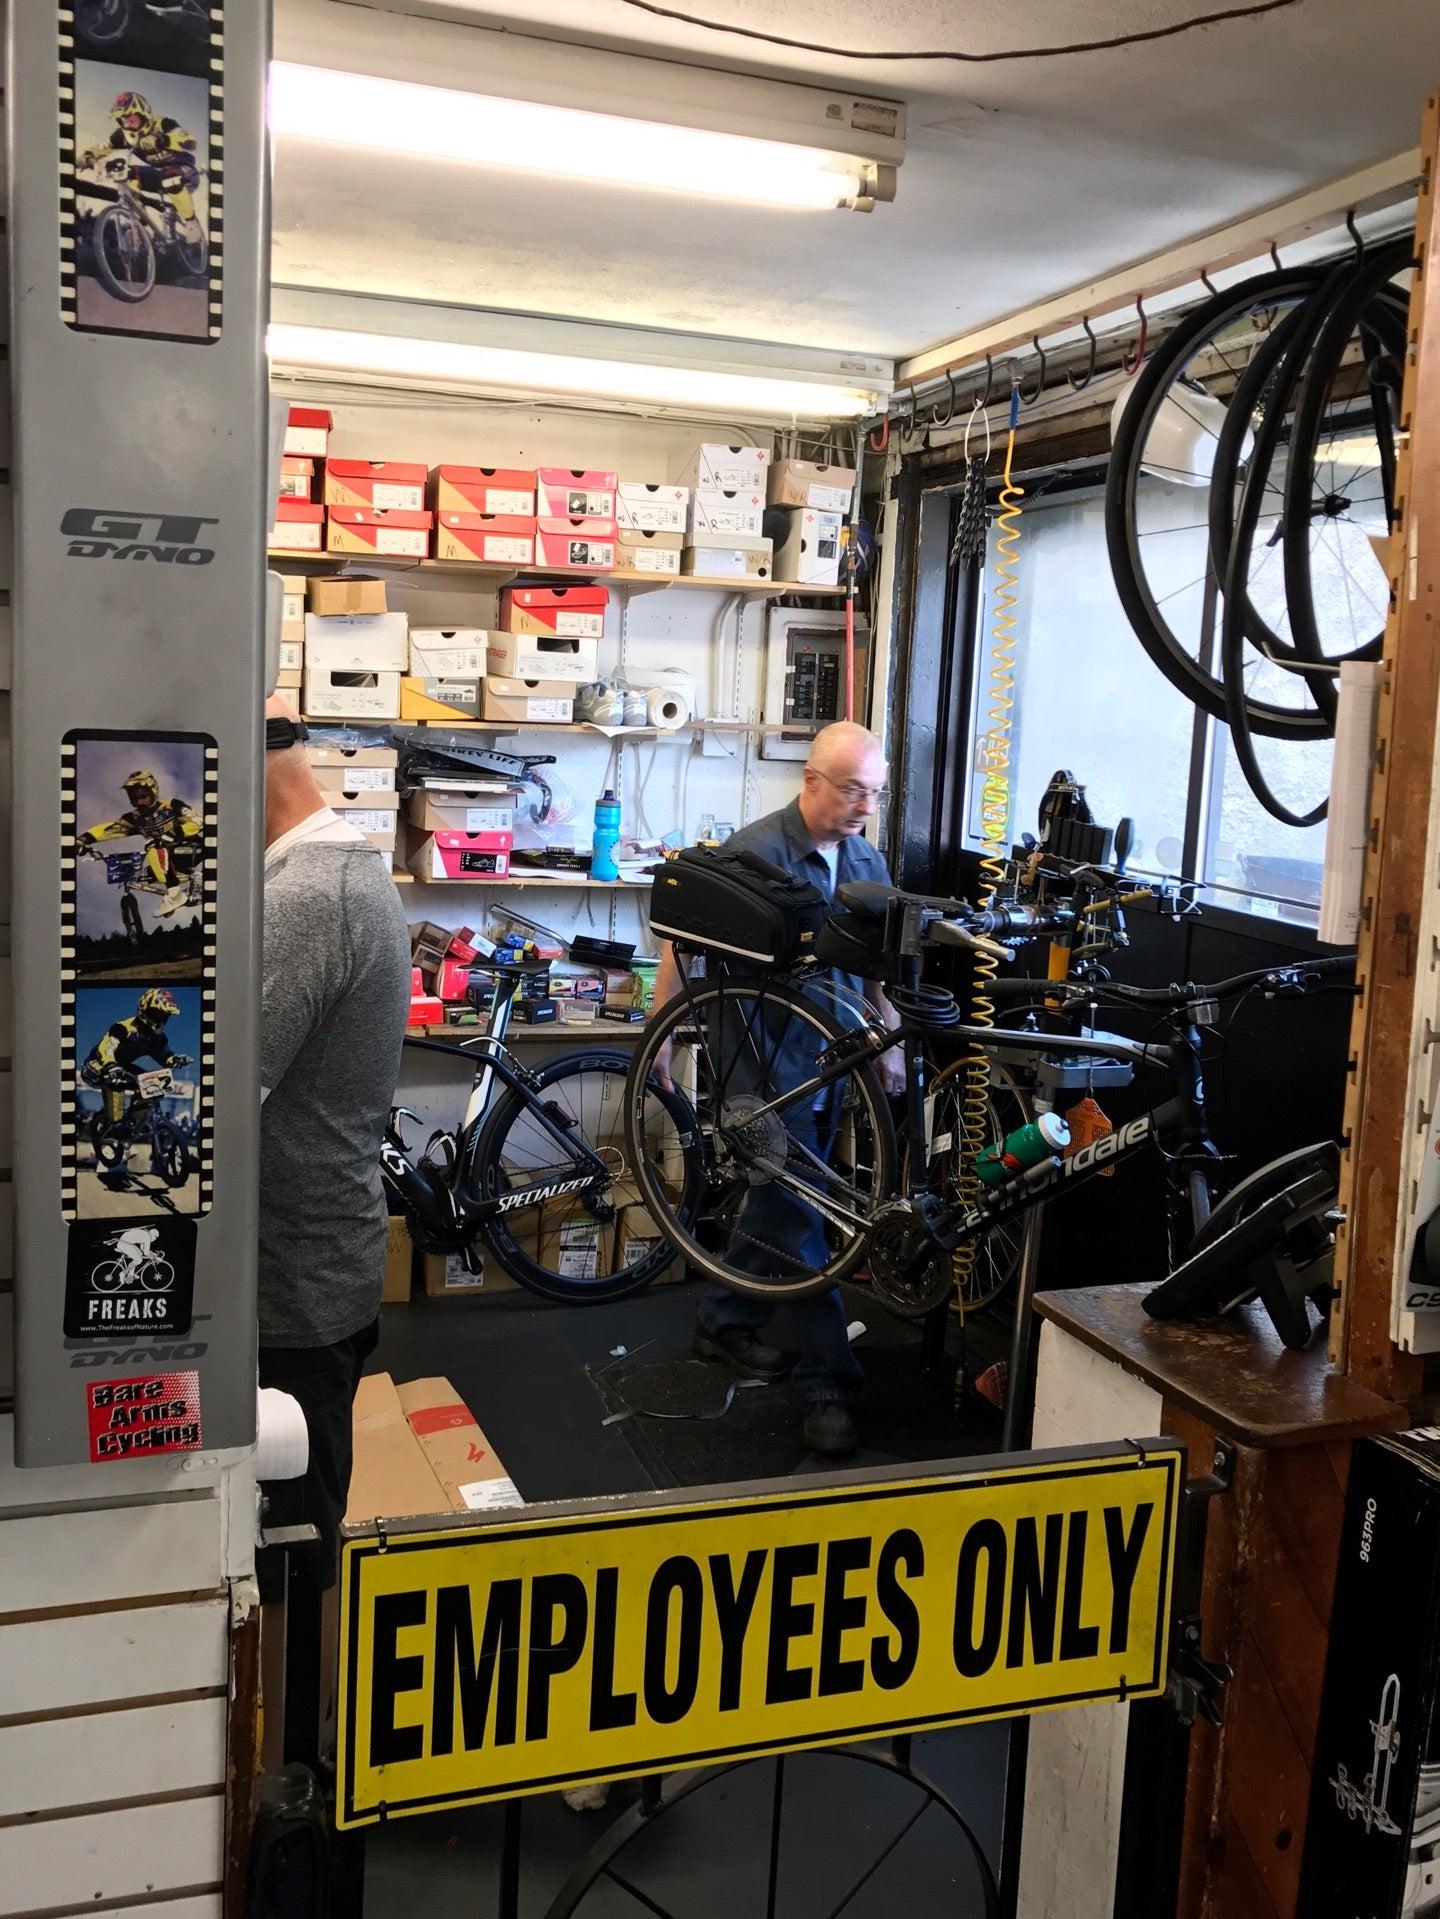 BENNETTS BICYCLES INC, bmx, hybrids, mountain bikes, road bikes, single-speed bikes,bicycles,bike repairs